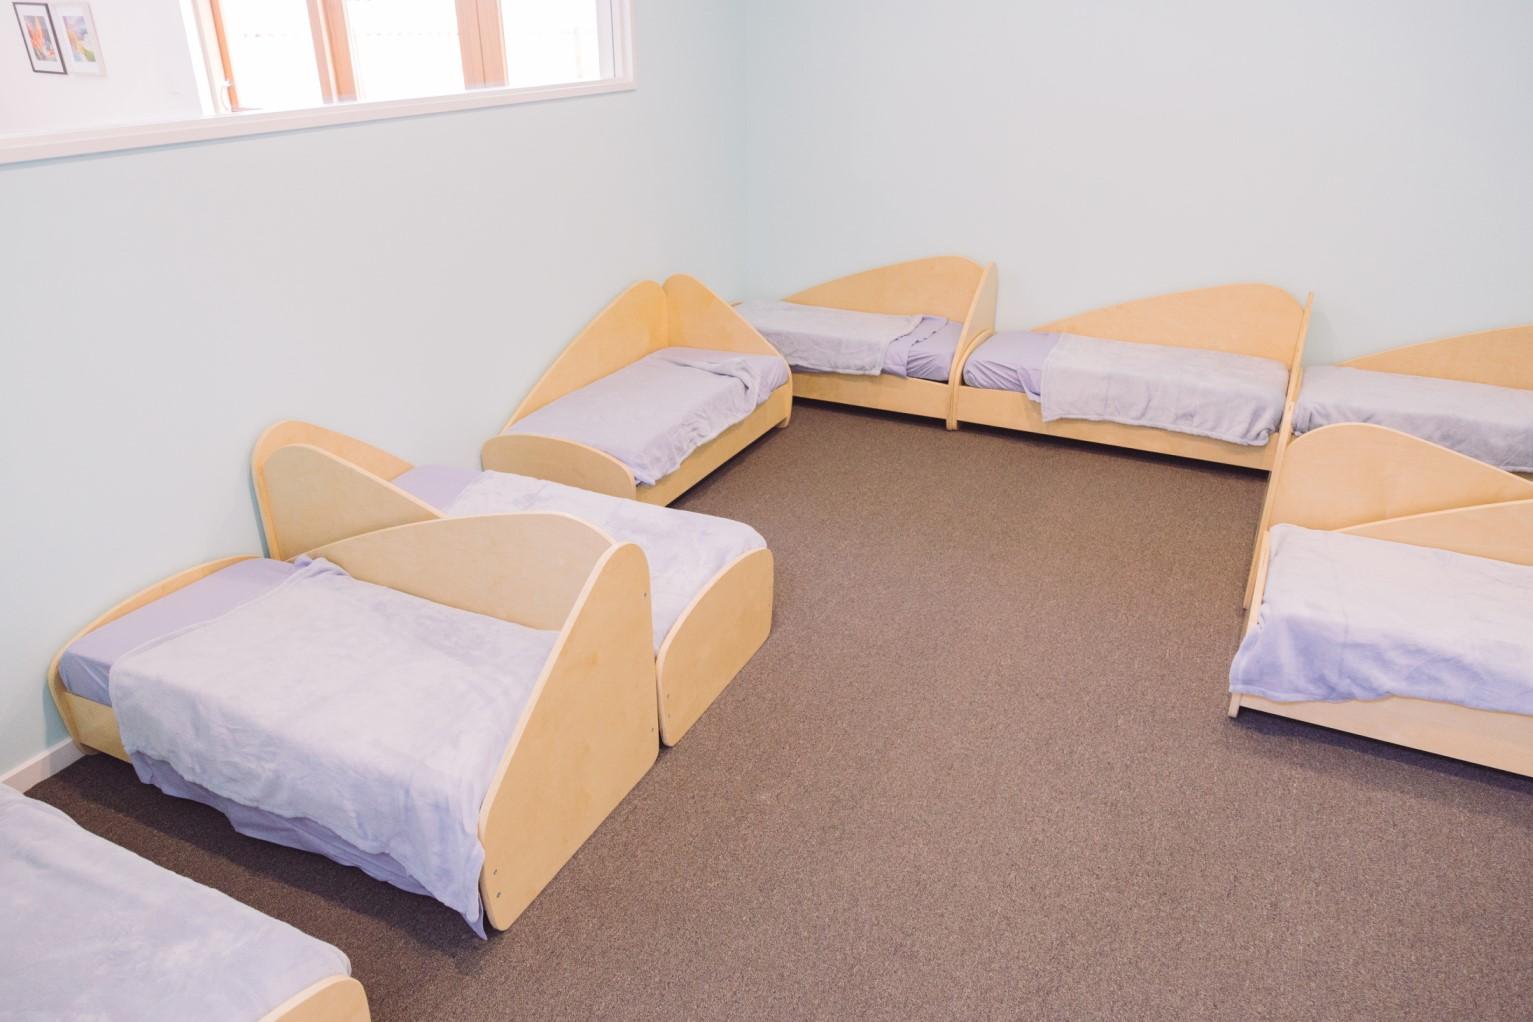 sleepingroom grow activeSpace Saver Wooden Bed with Mattress